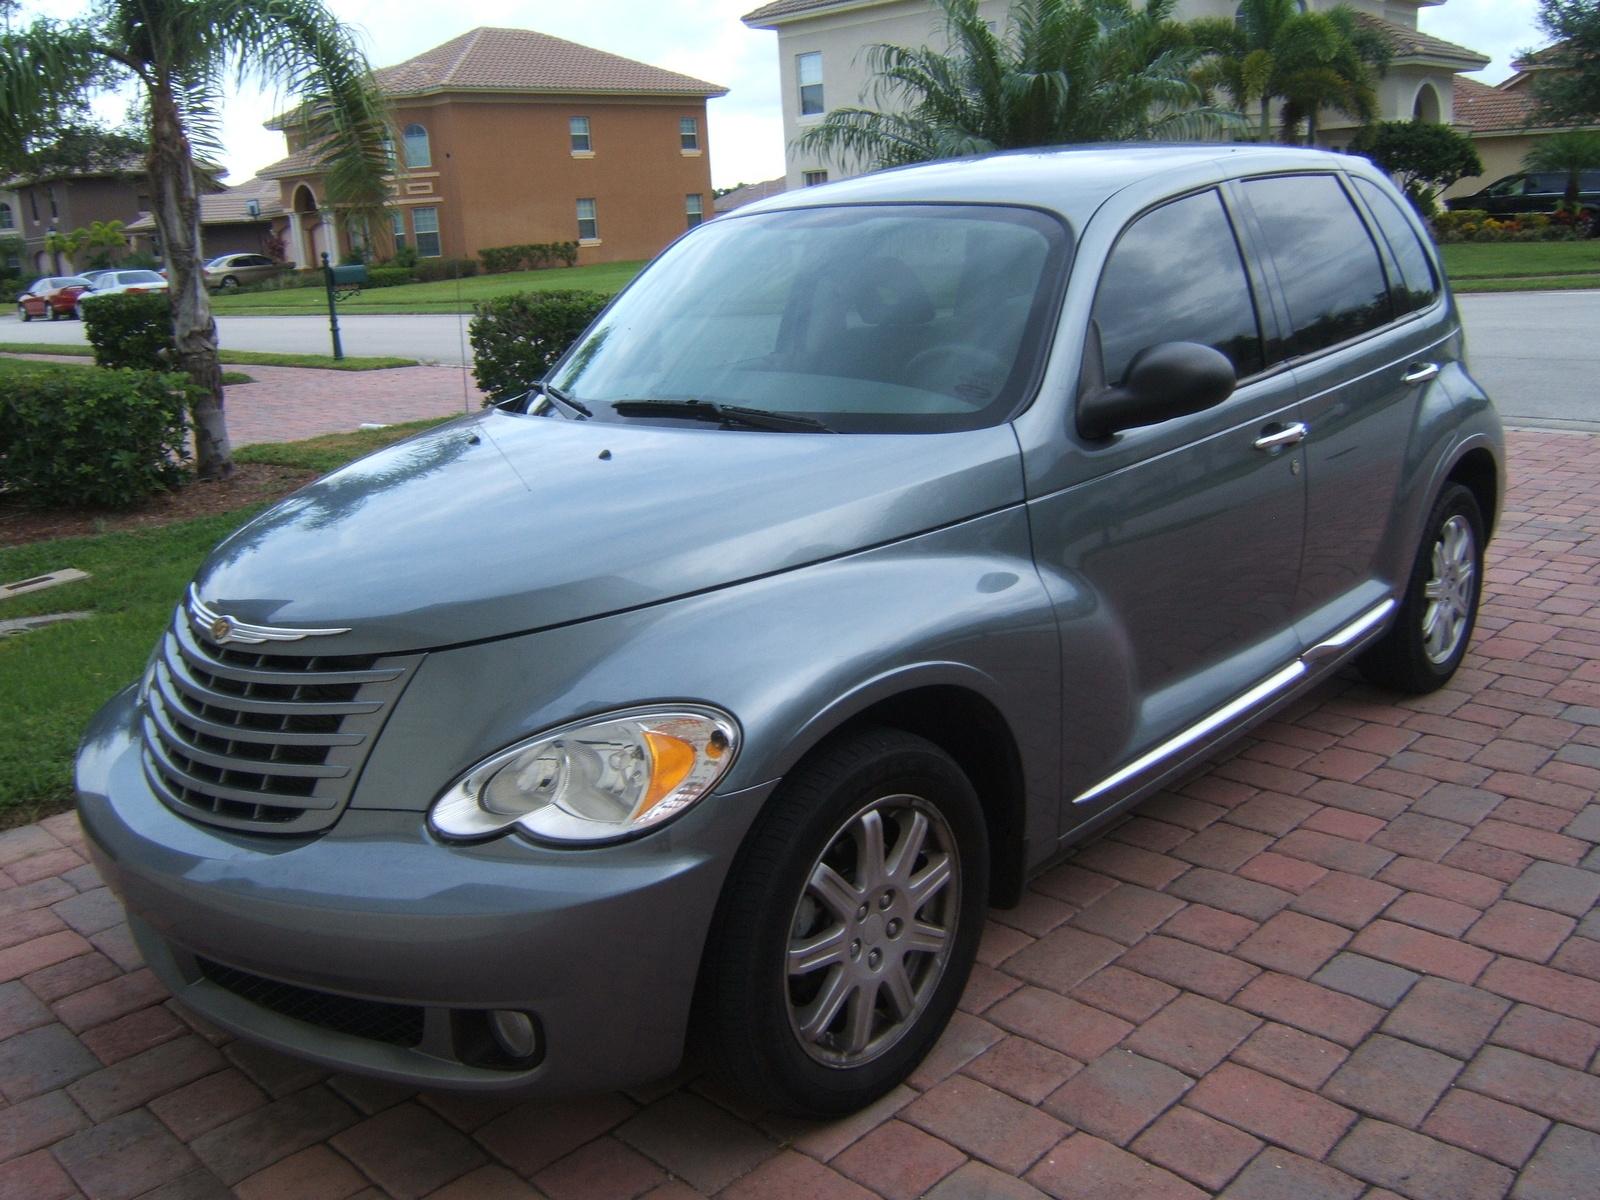 2009 Chrysler Pt Cruiser Pictures Cargurus